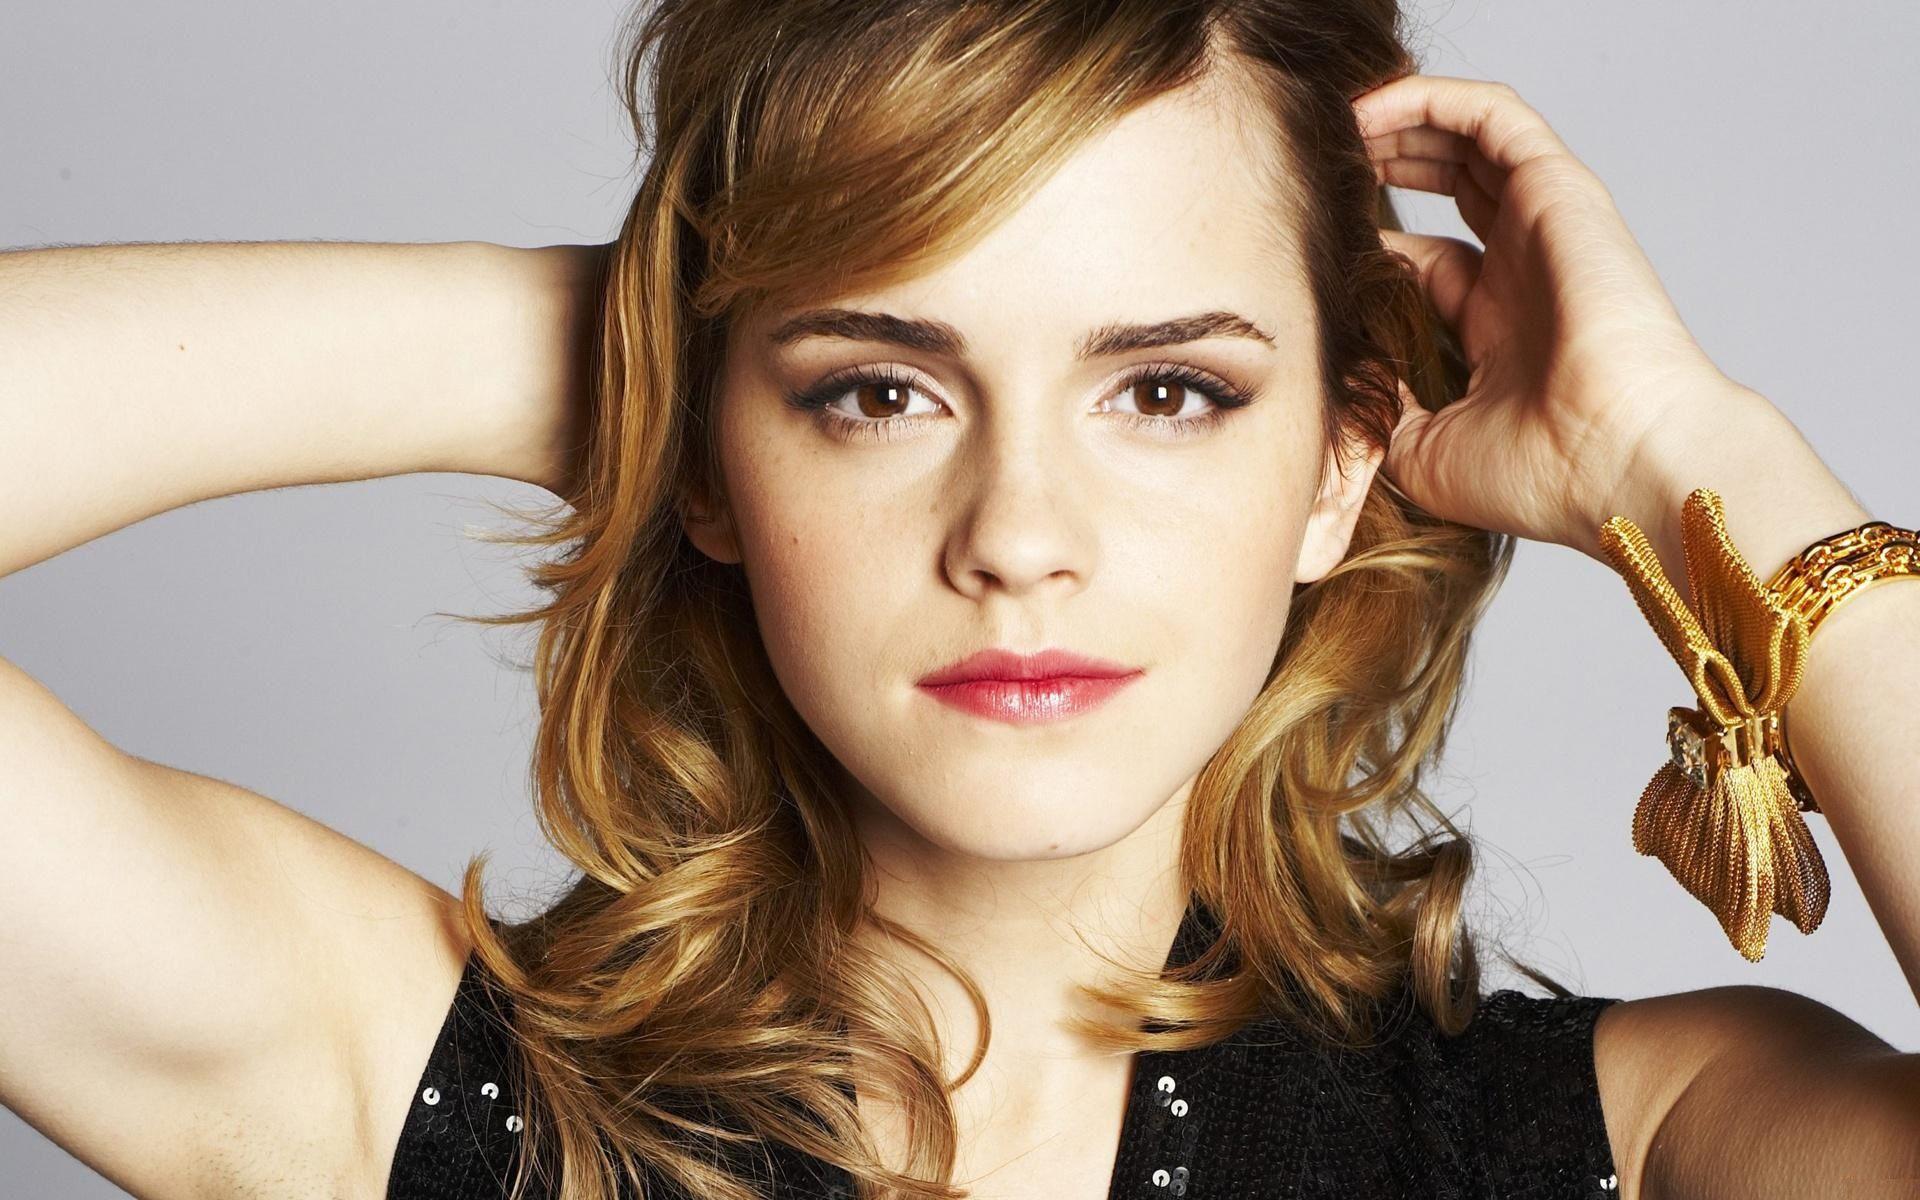 Emma Watson Hd Wallpapers Free Download Latest Emma Watson Hd Wallpapers For Computer Mobile Iphone Emma Watson Beautiful Emma Watson Emma Watson Wallpaper